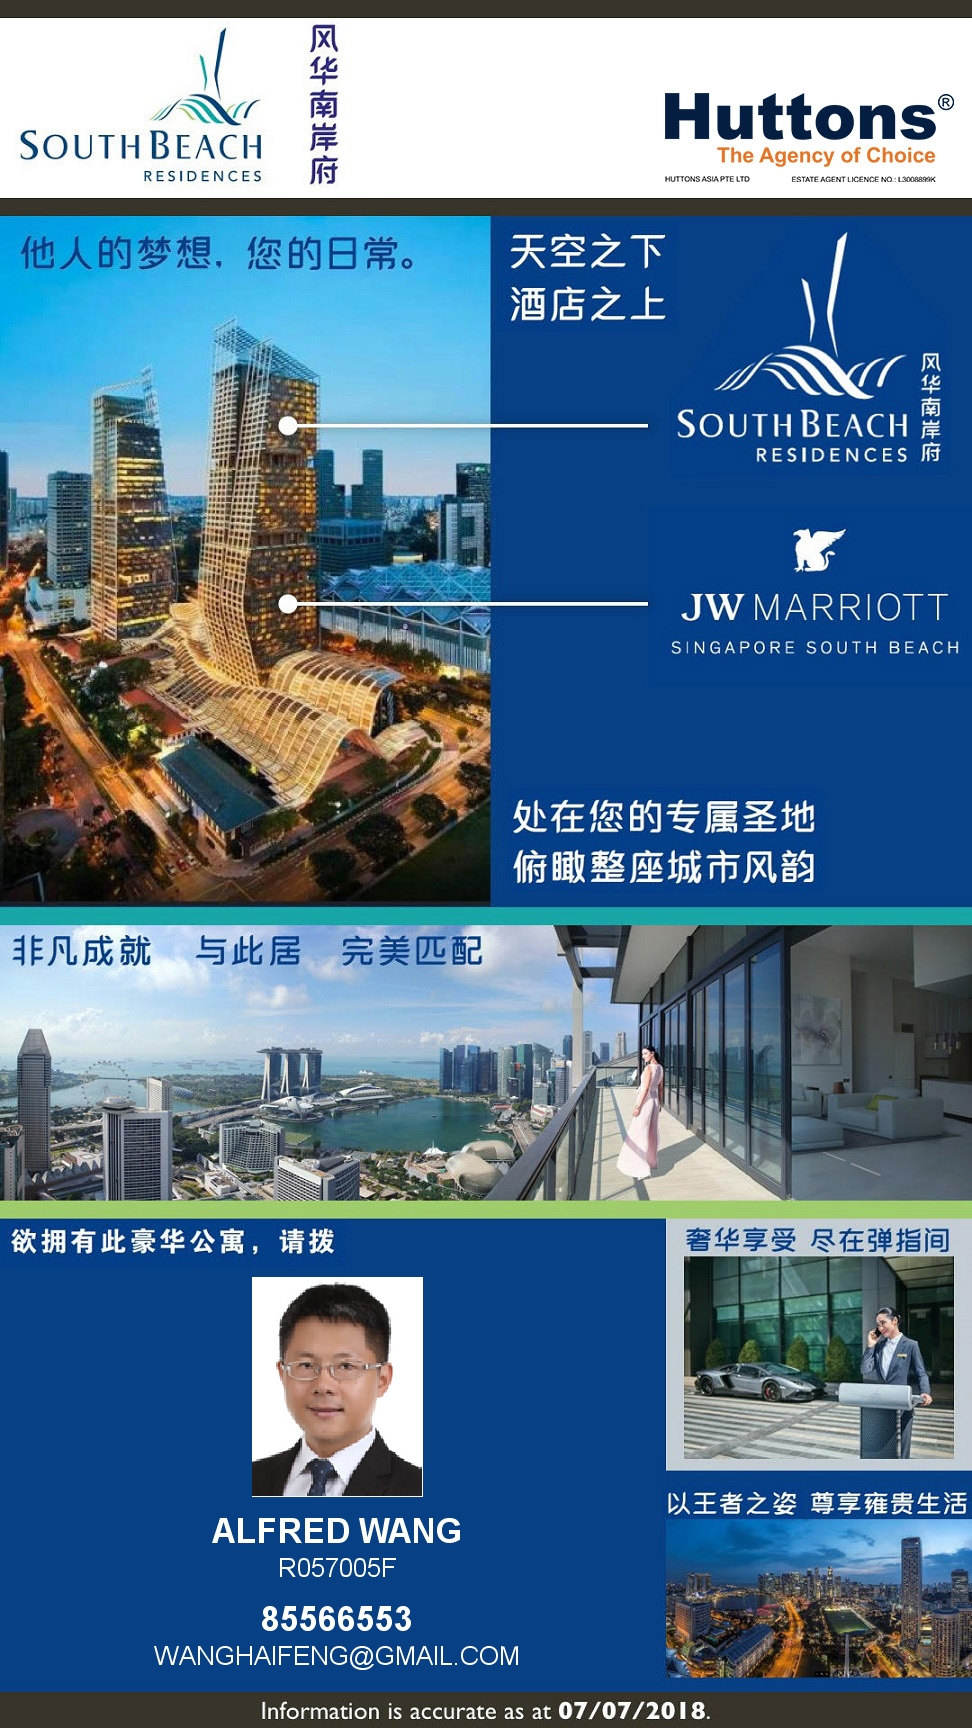 EDM-South%20Beach%20Residences%20(Chinese)